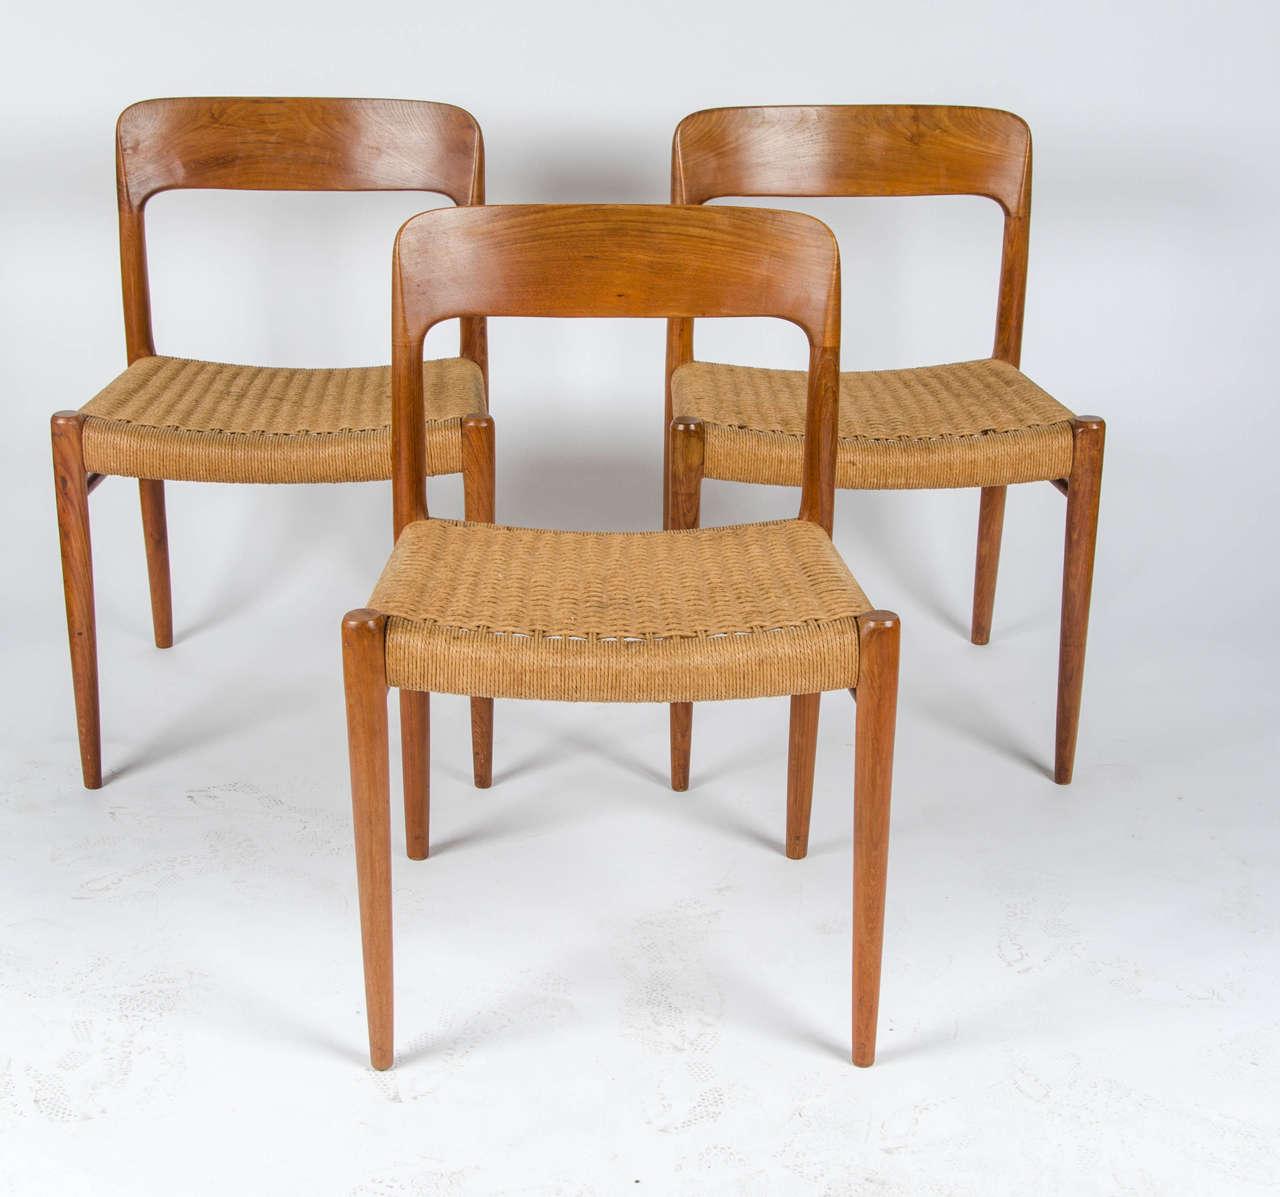 Niels O. Møller For JL Möller, Model 75 Chairs 2